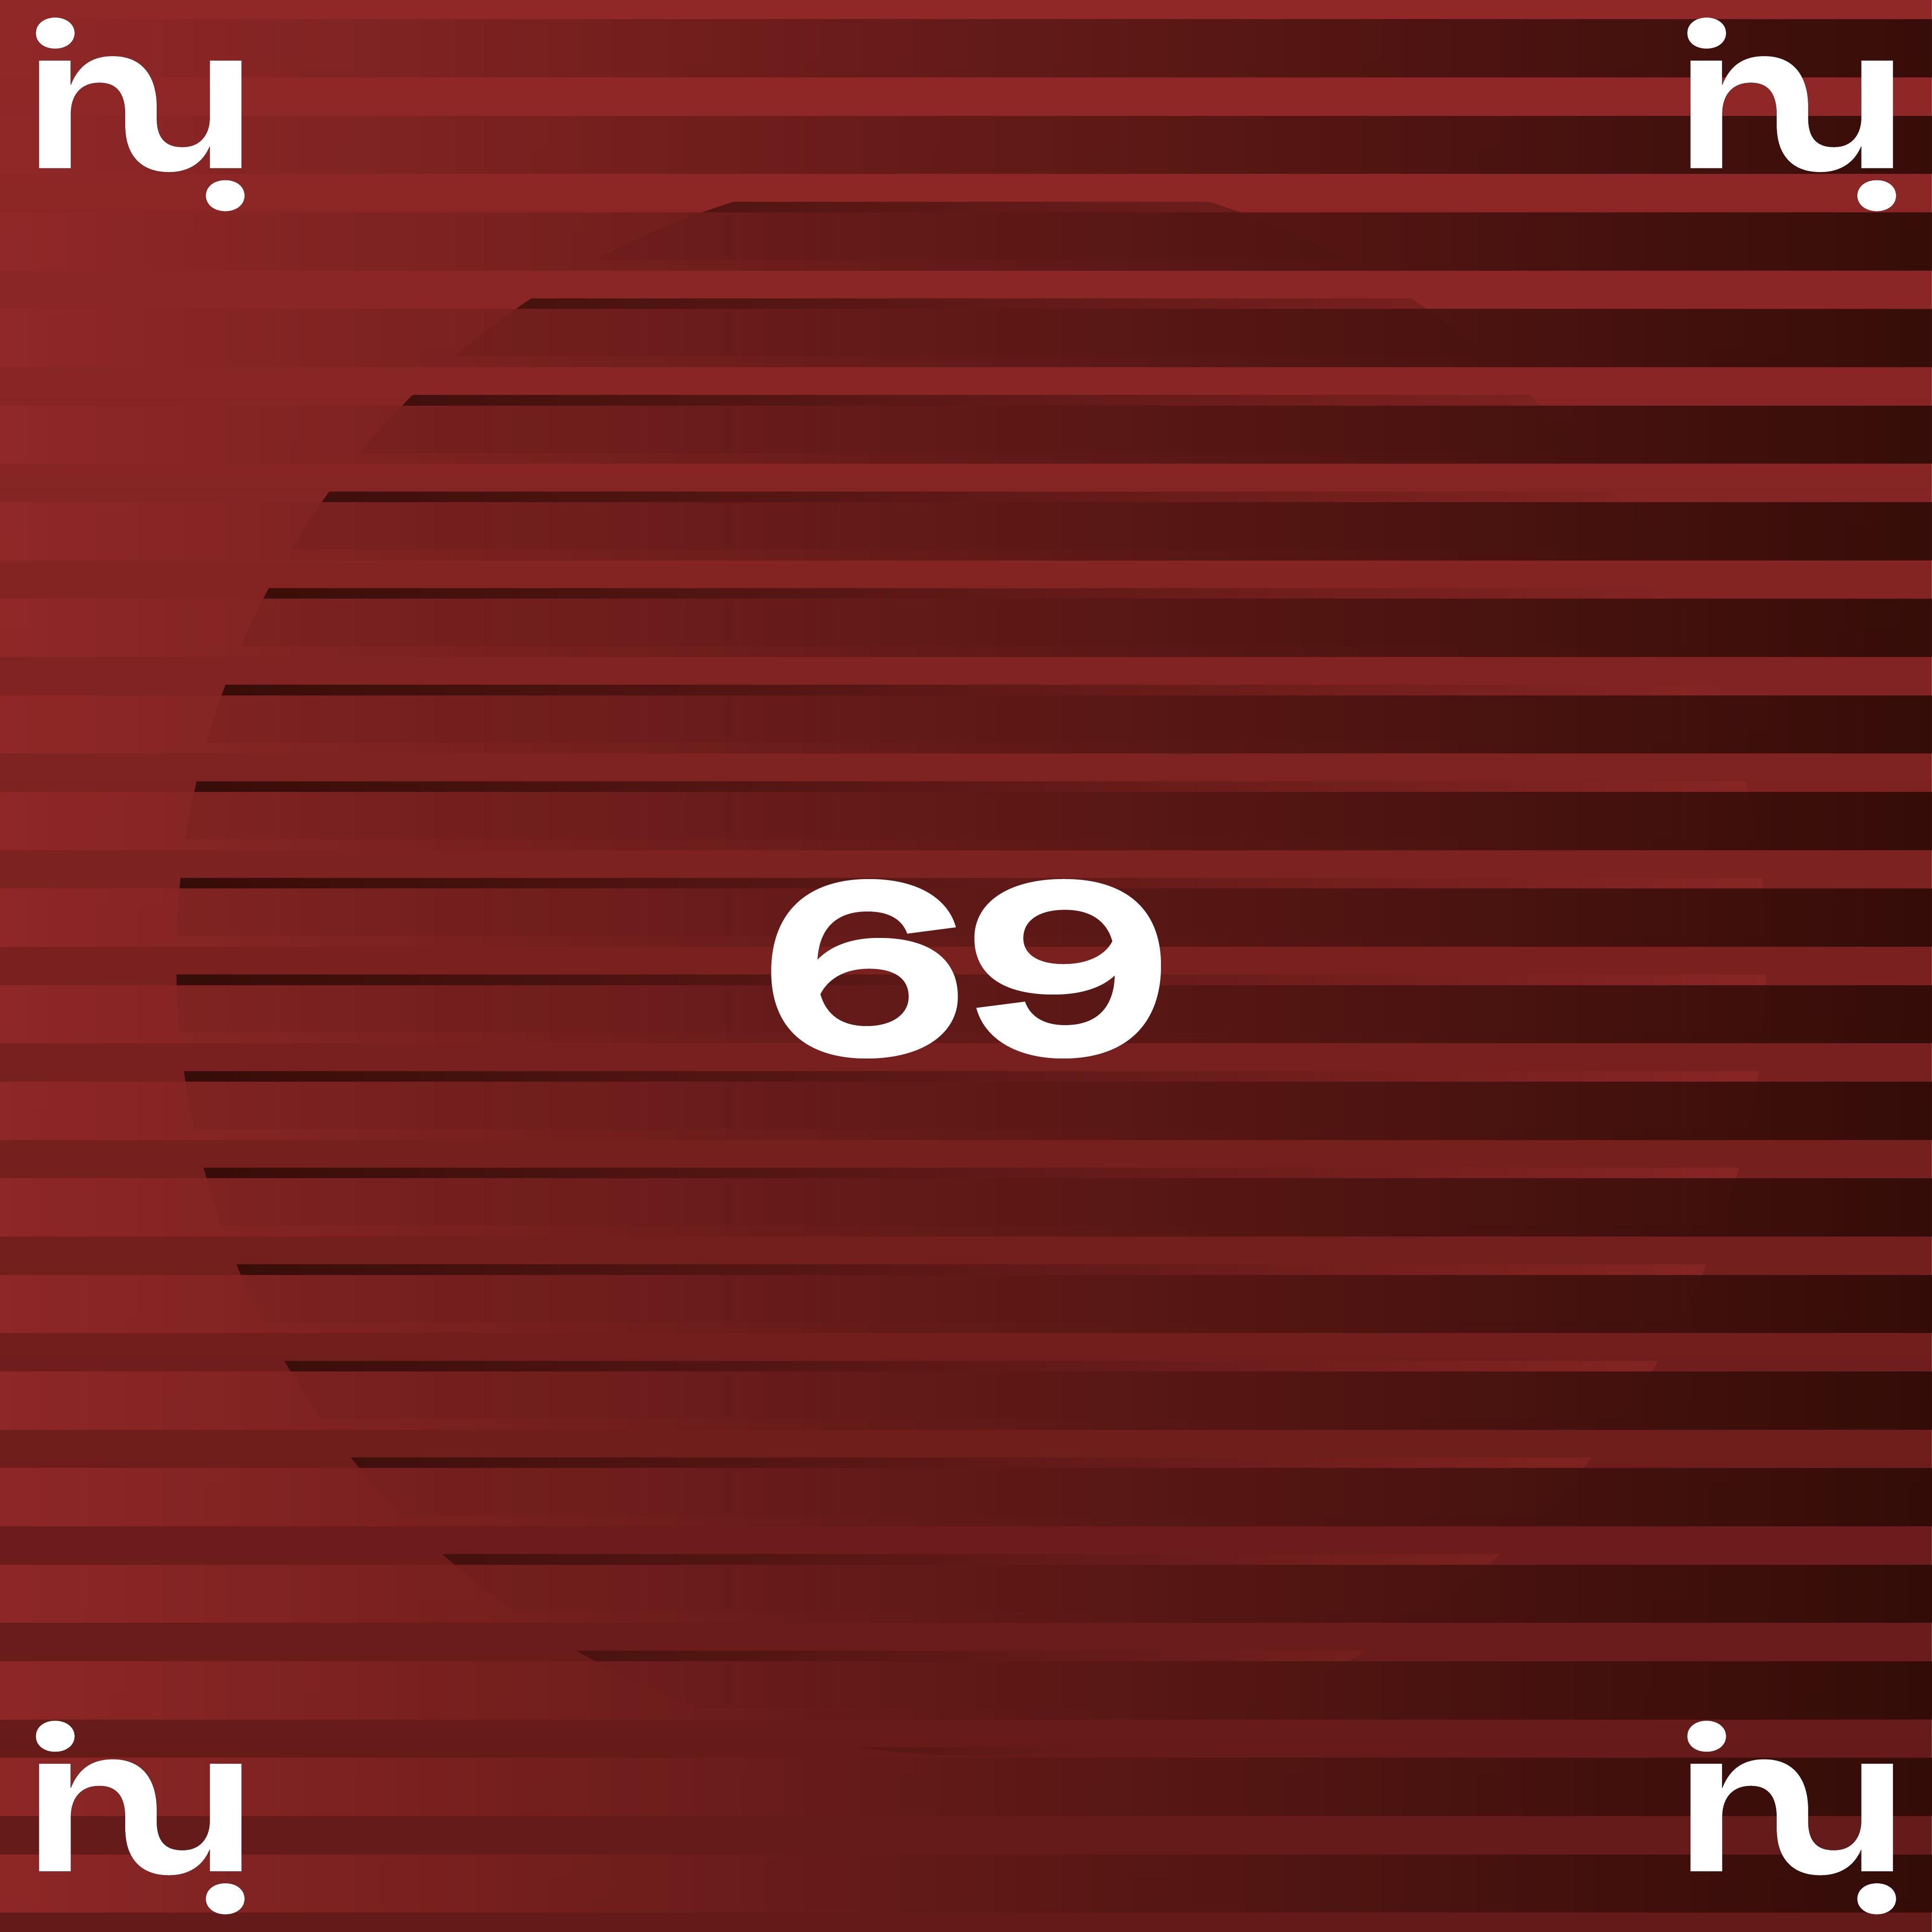 LISTENUP_PLAYLIST #69